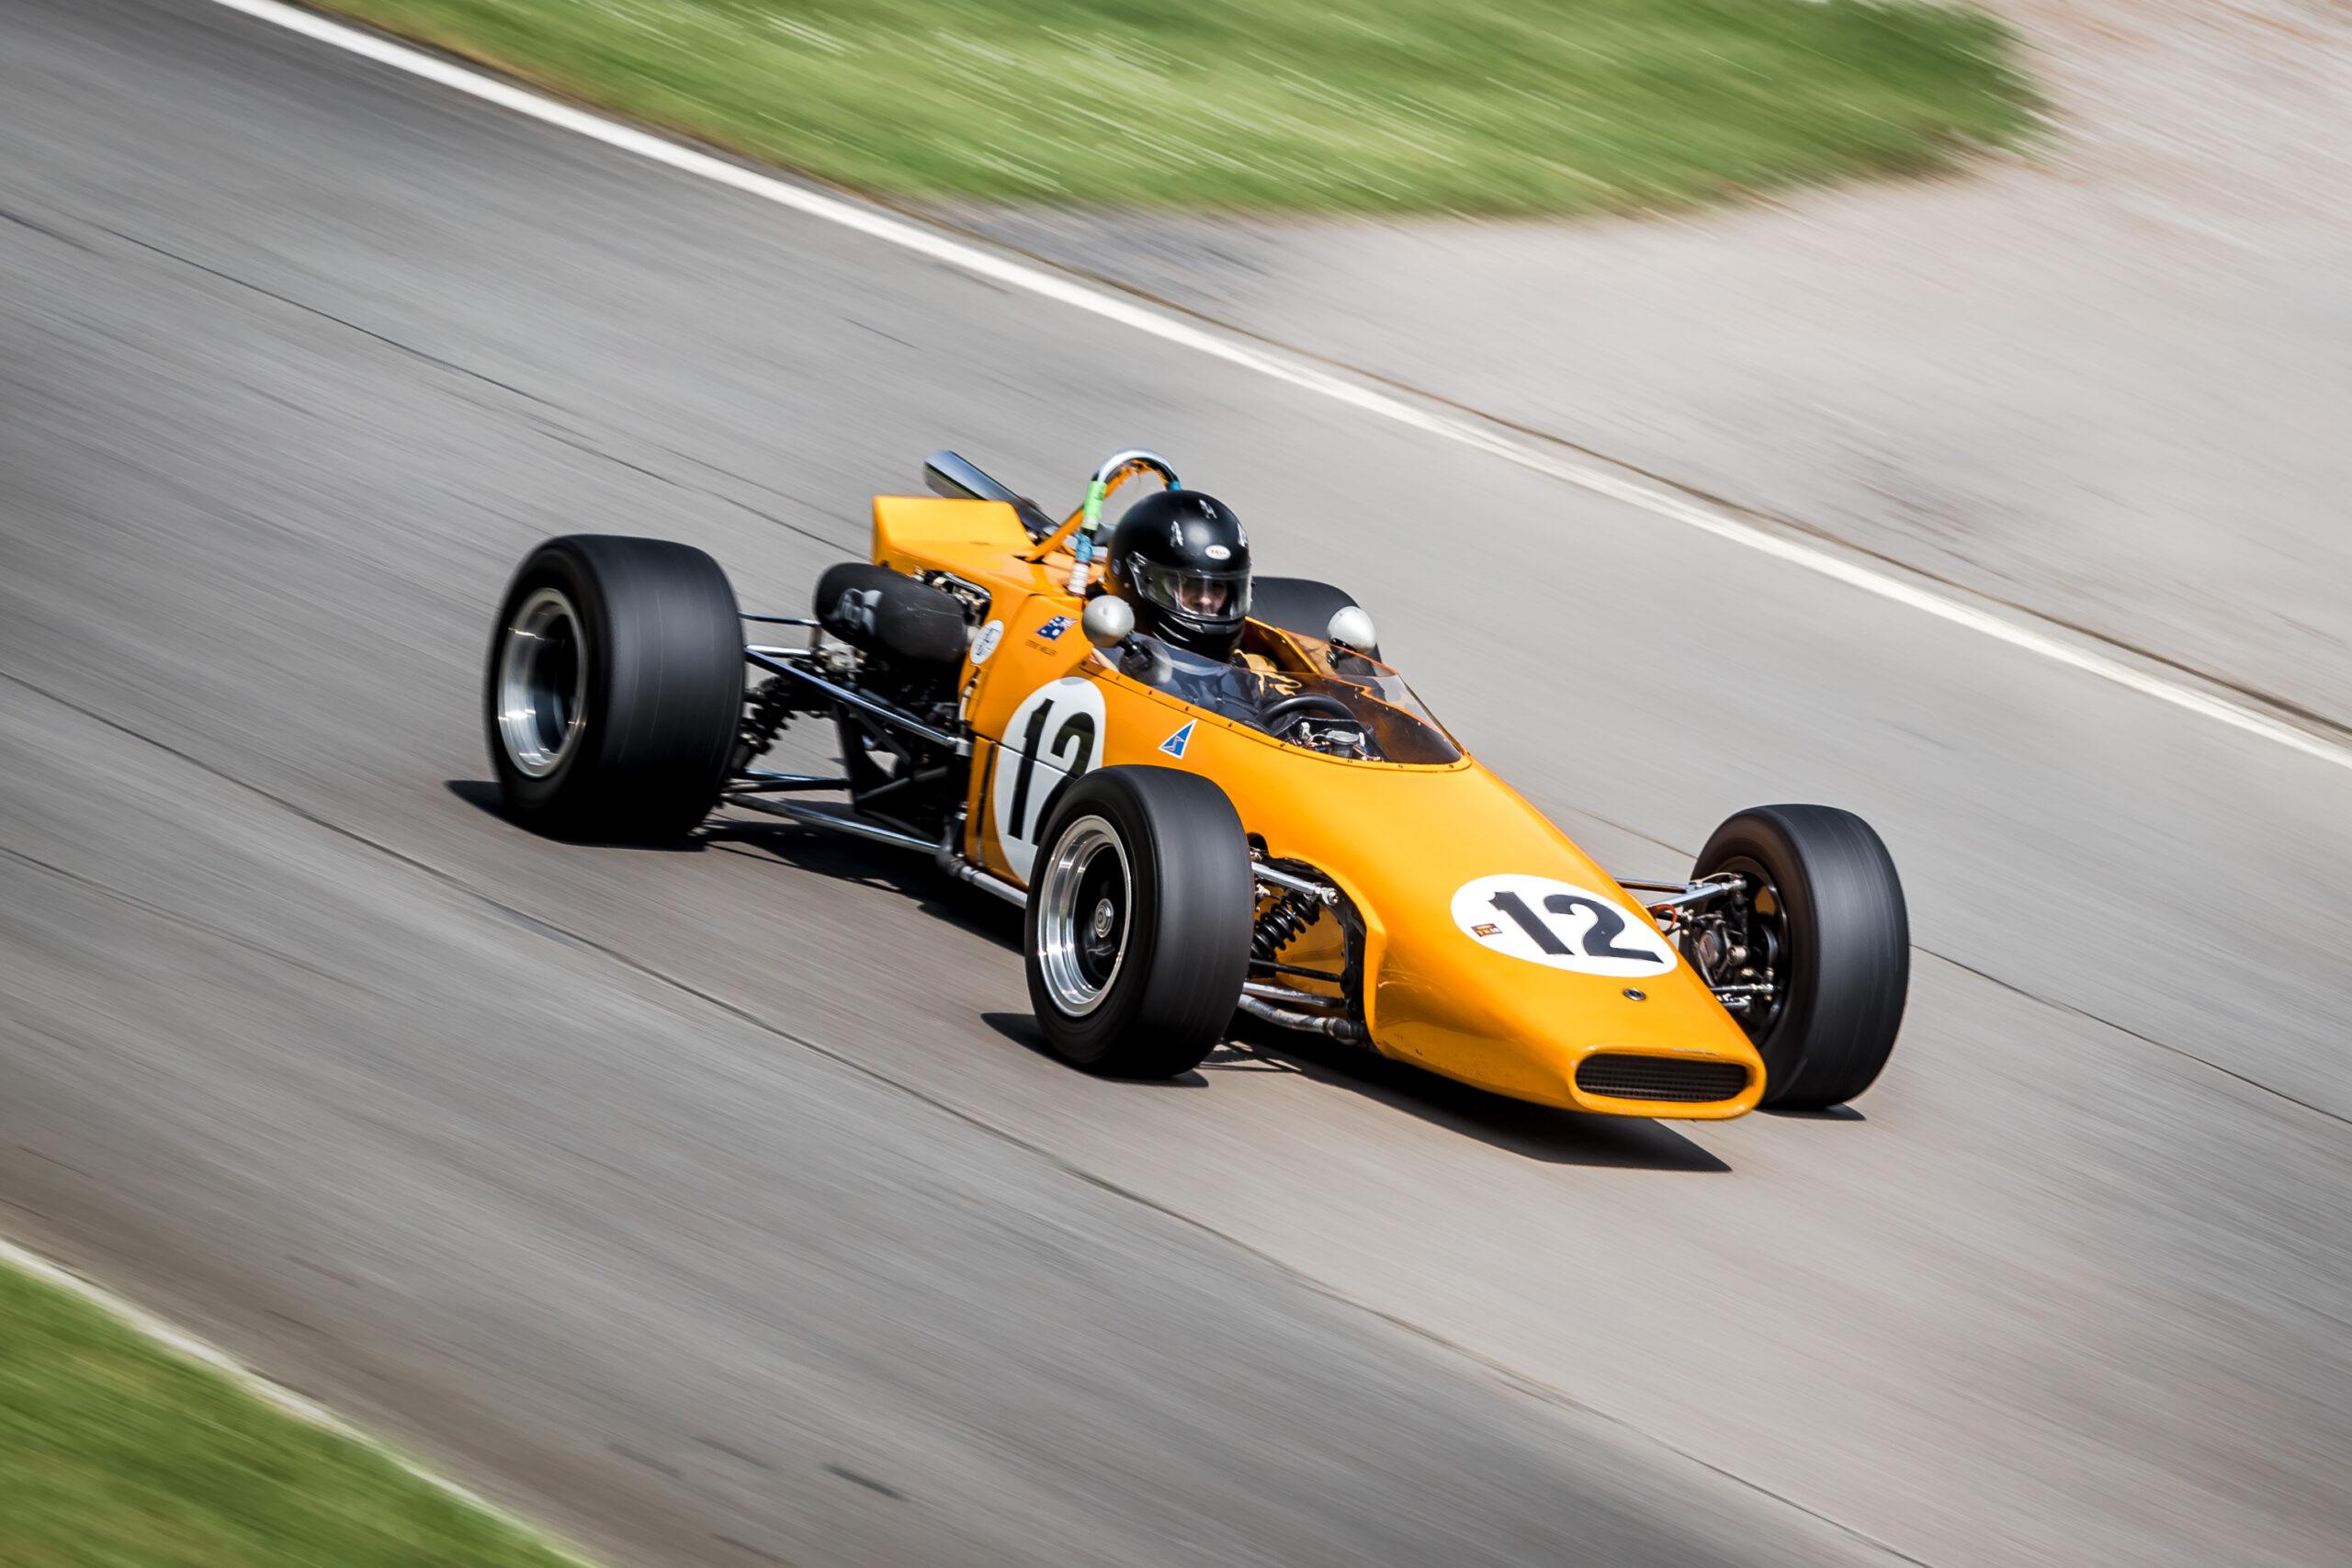 Single seat historic race car